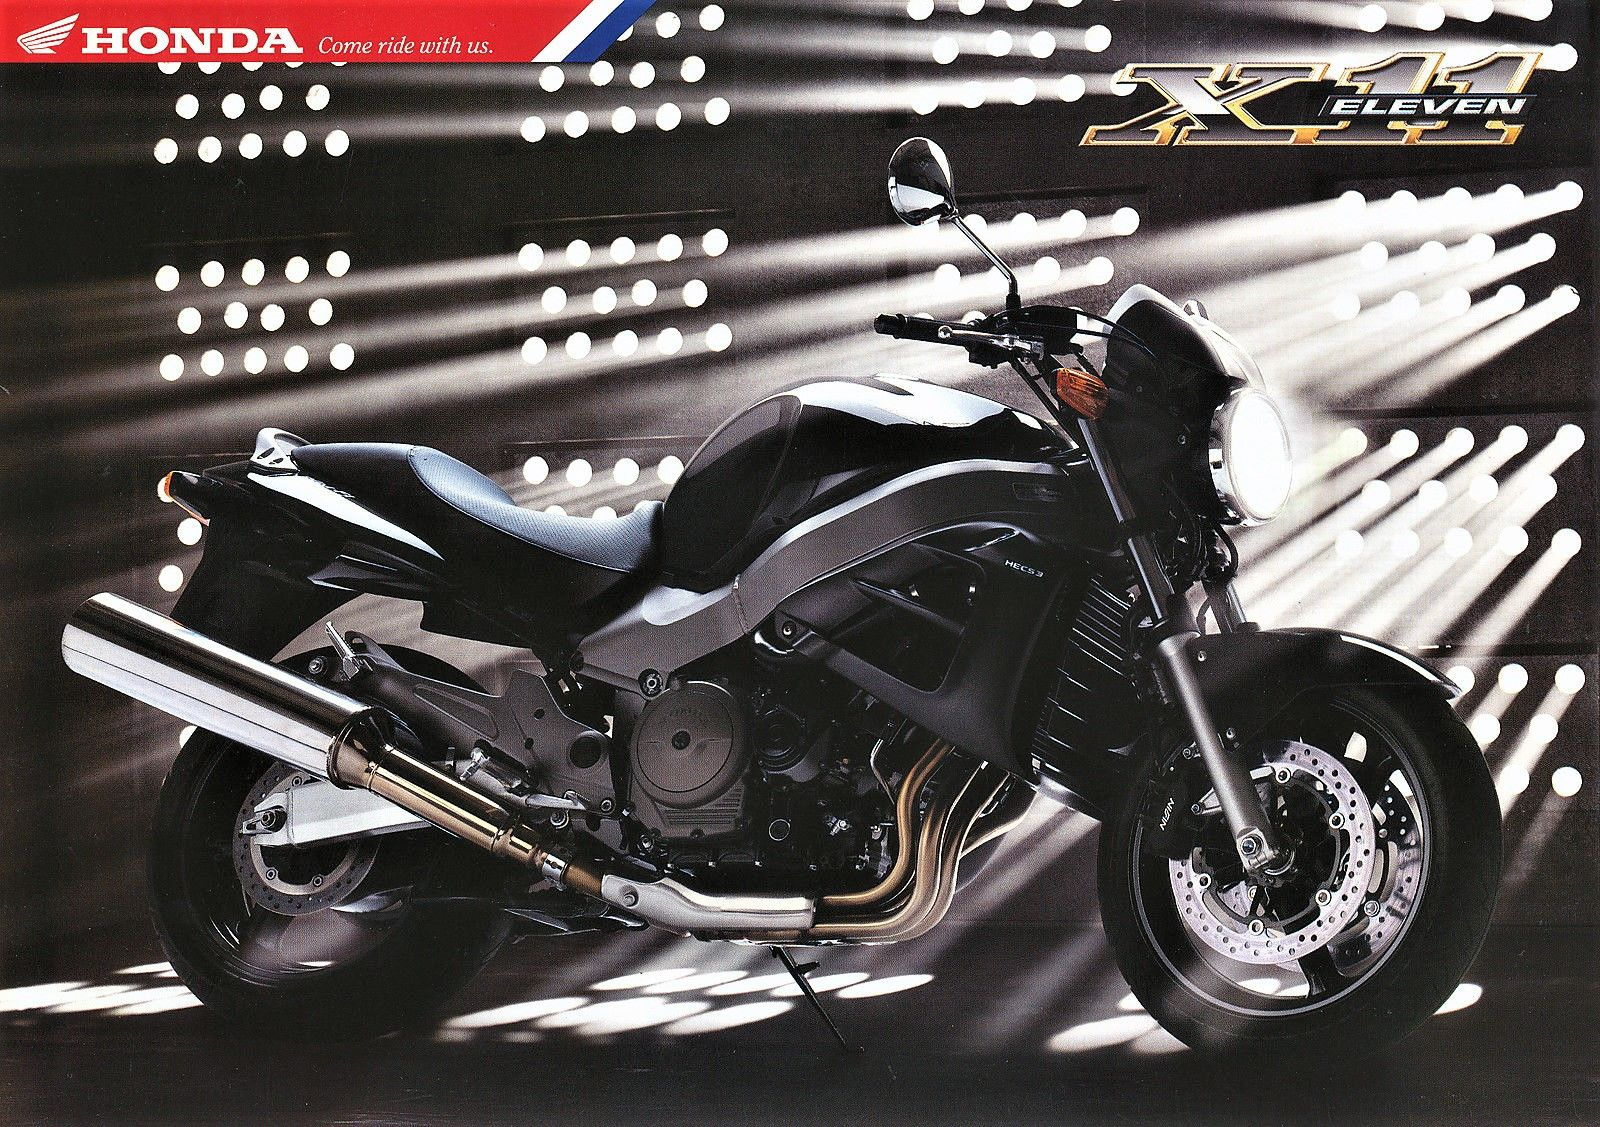 Honda X-11 CB 1100 SF X-Eleven 1999 - Galerie moto